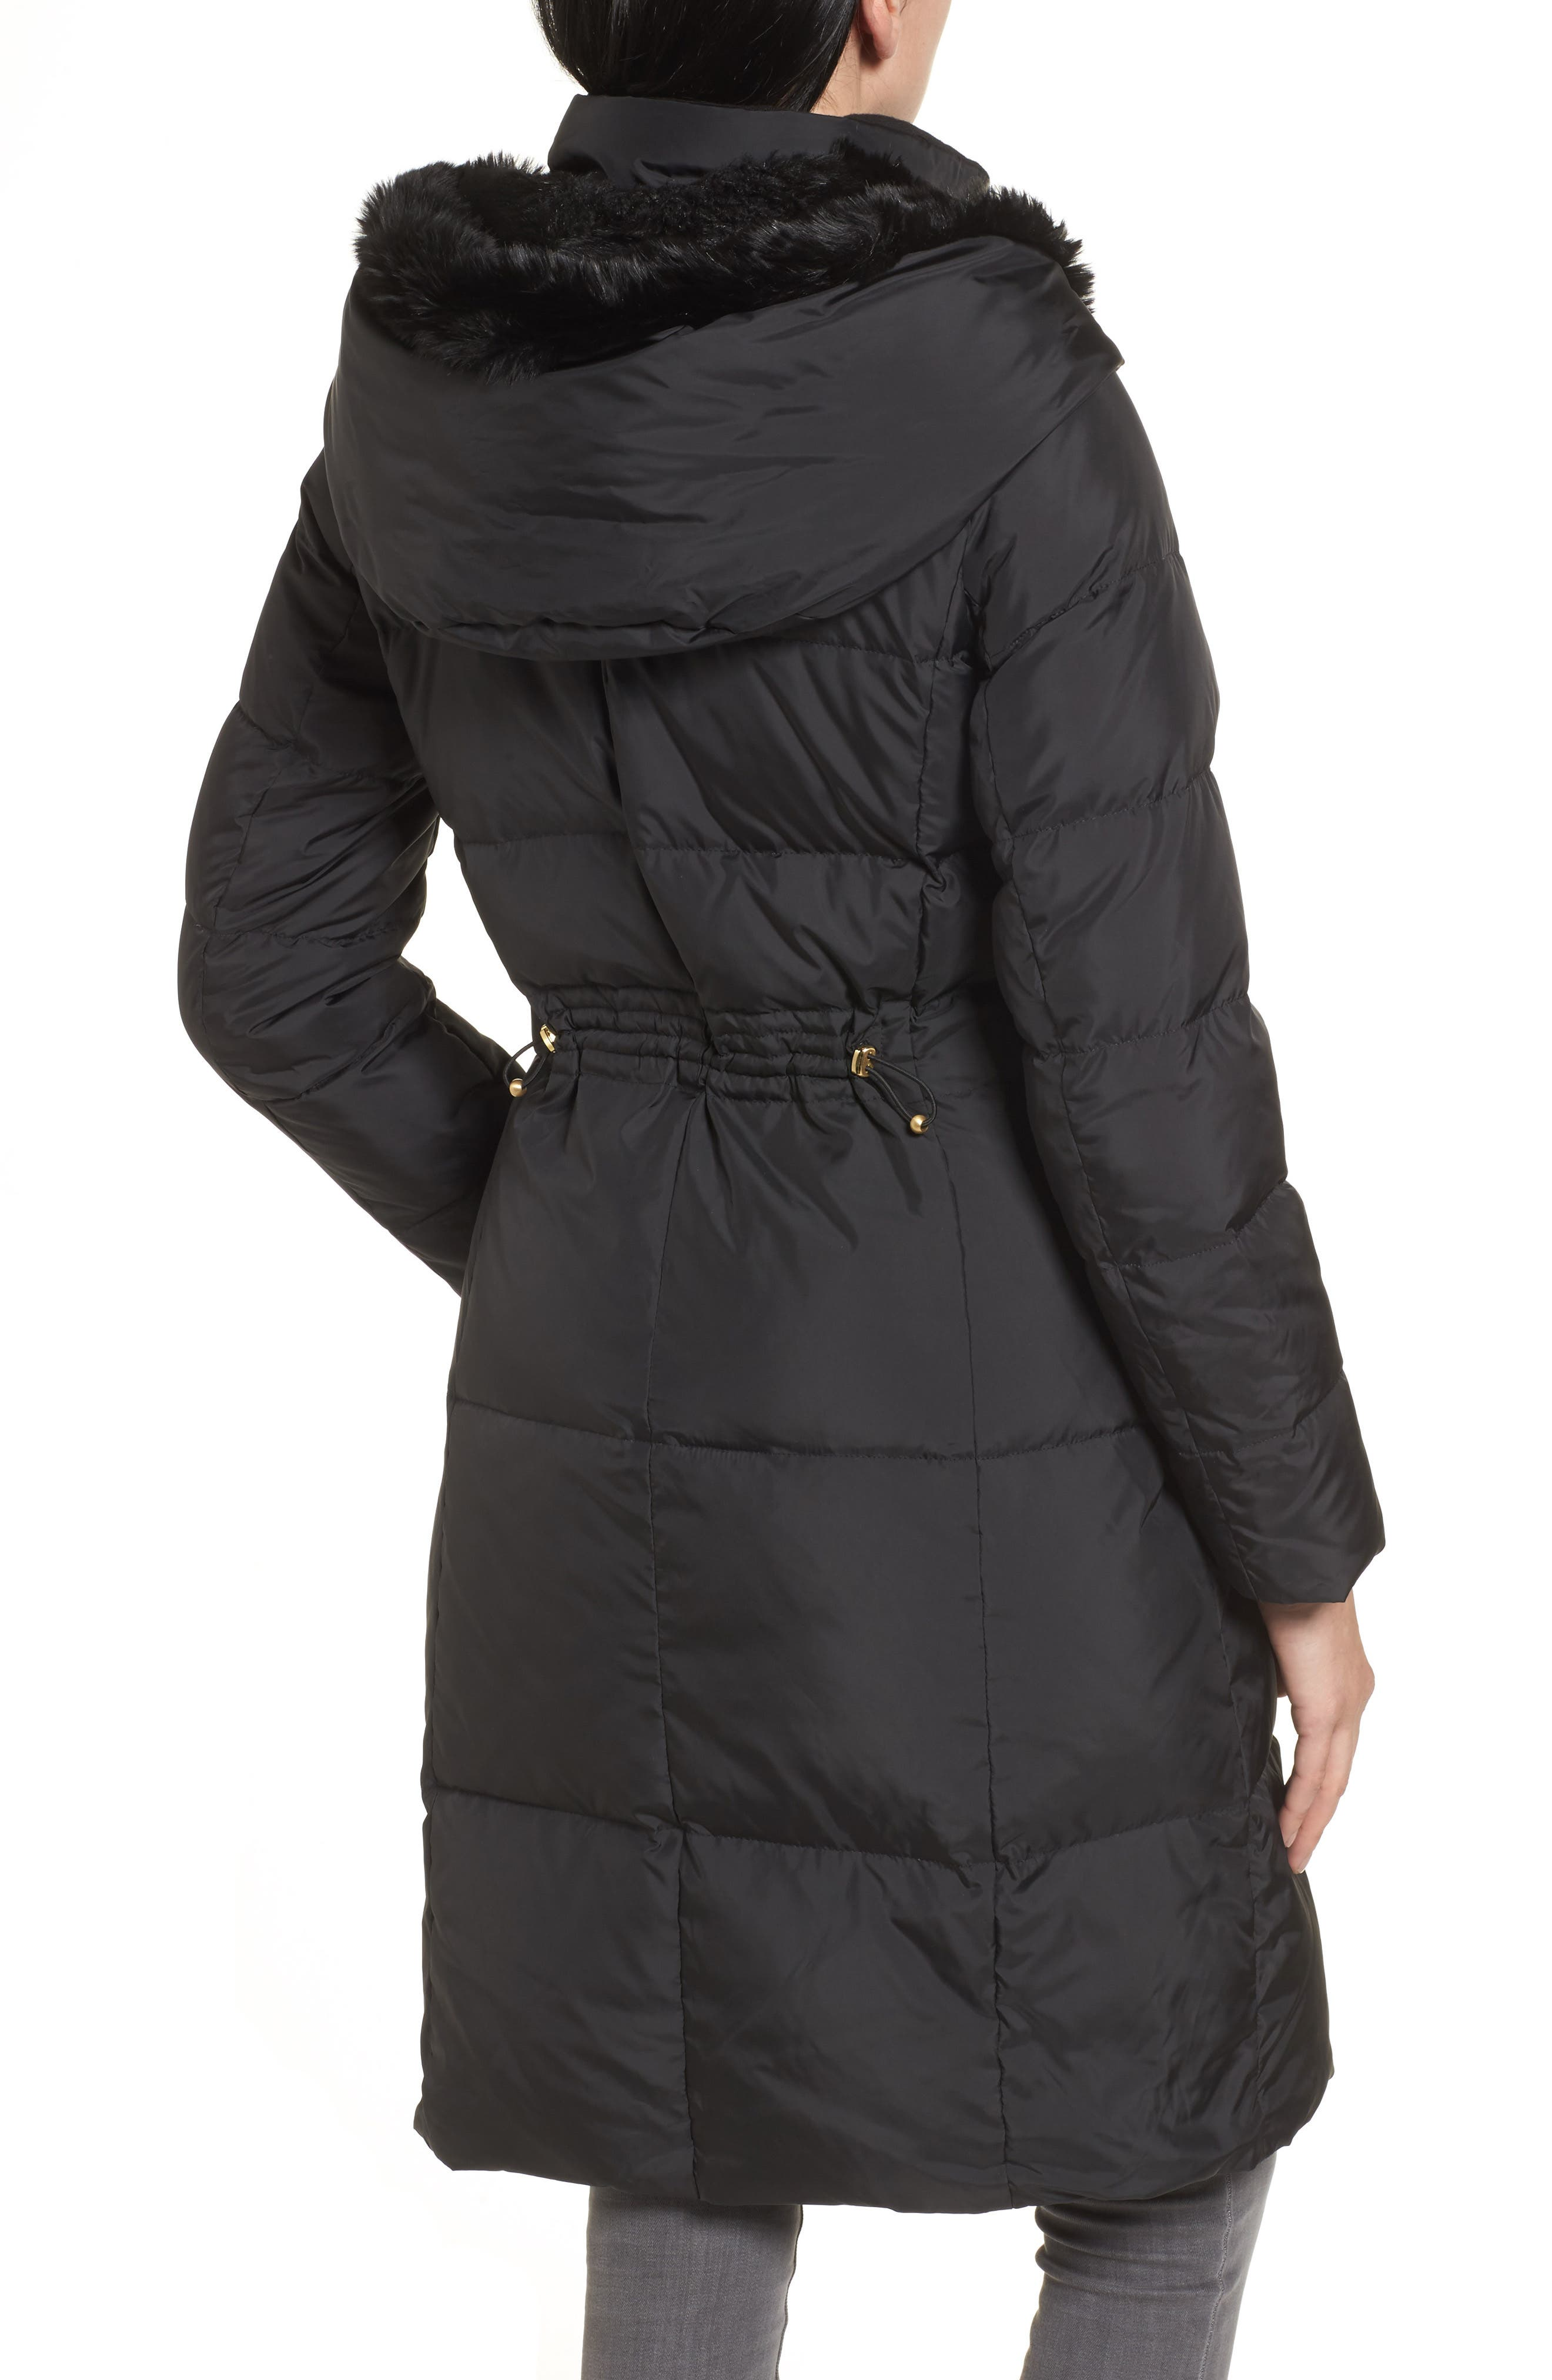 3/4 Down Coat with Faux Fur Hood,                             Alternate thumbnail 2, color,                             001